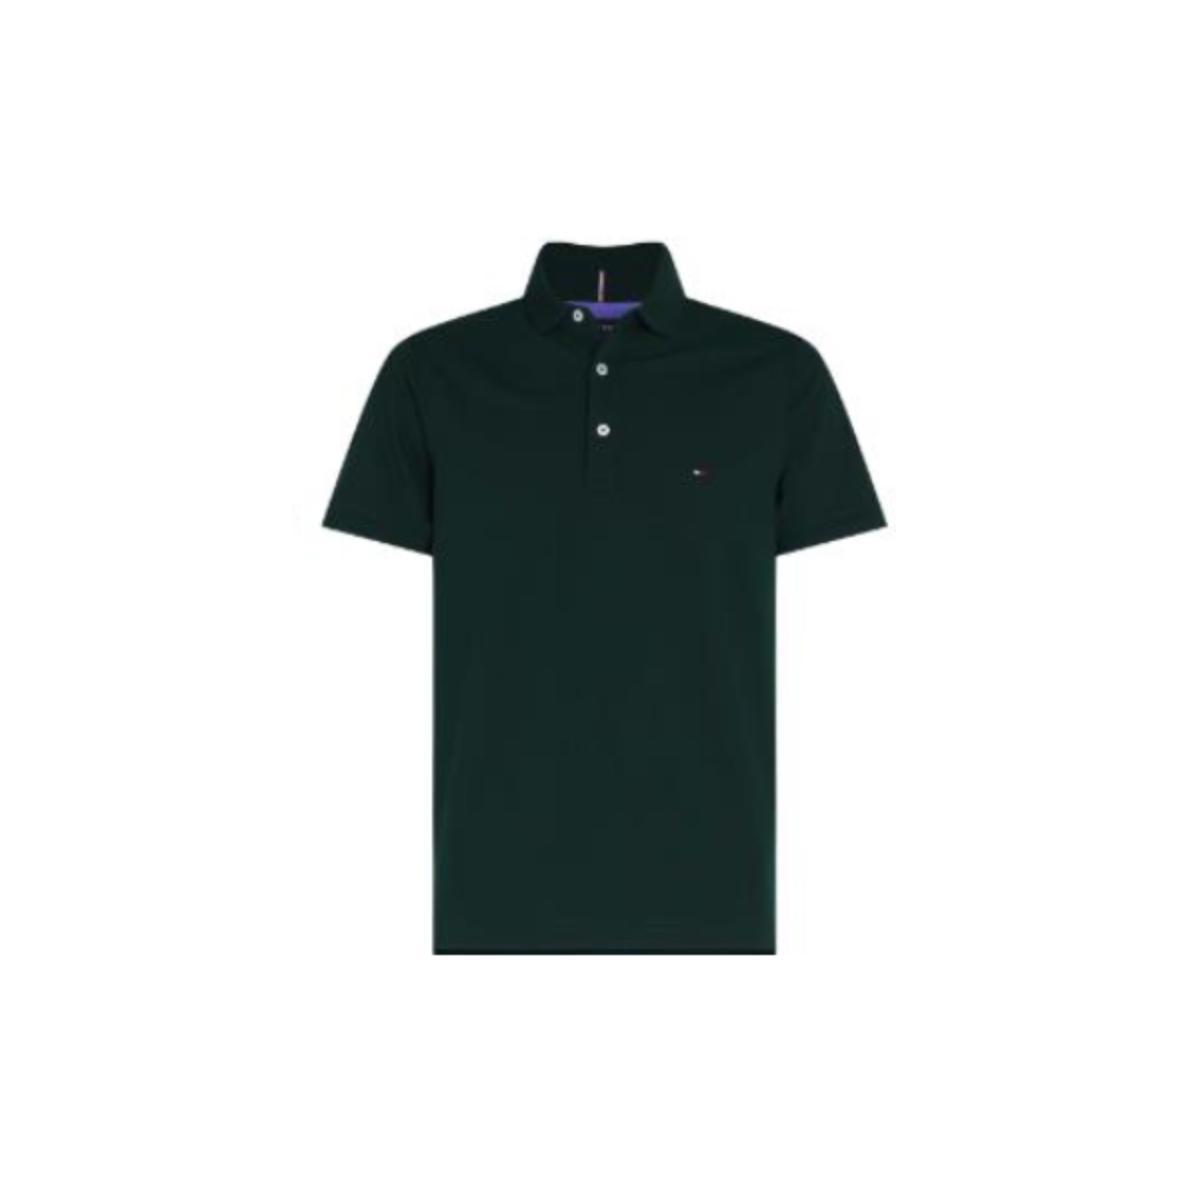 Camiseta Masculina Tommy Thmw0mw10765 Thmbp Verde